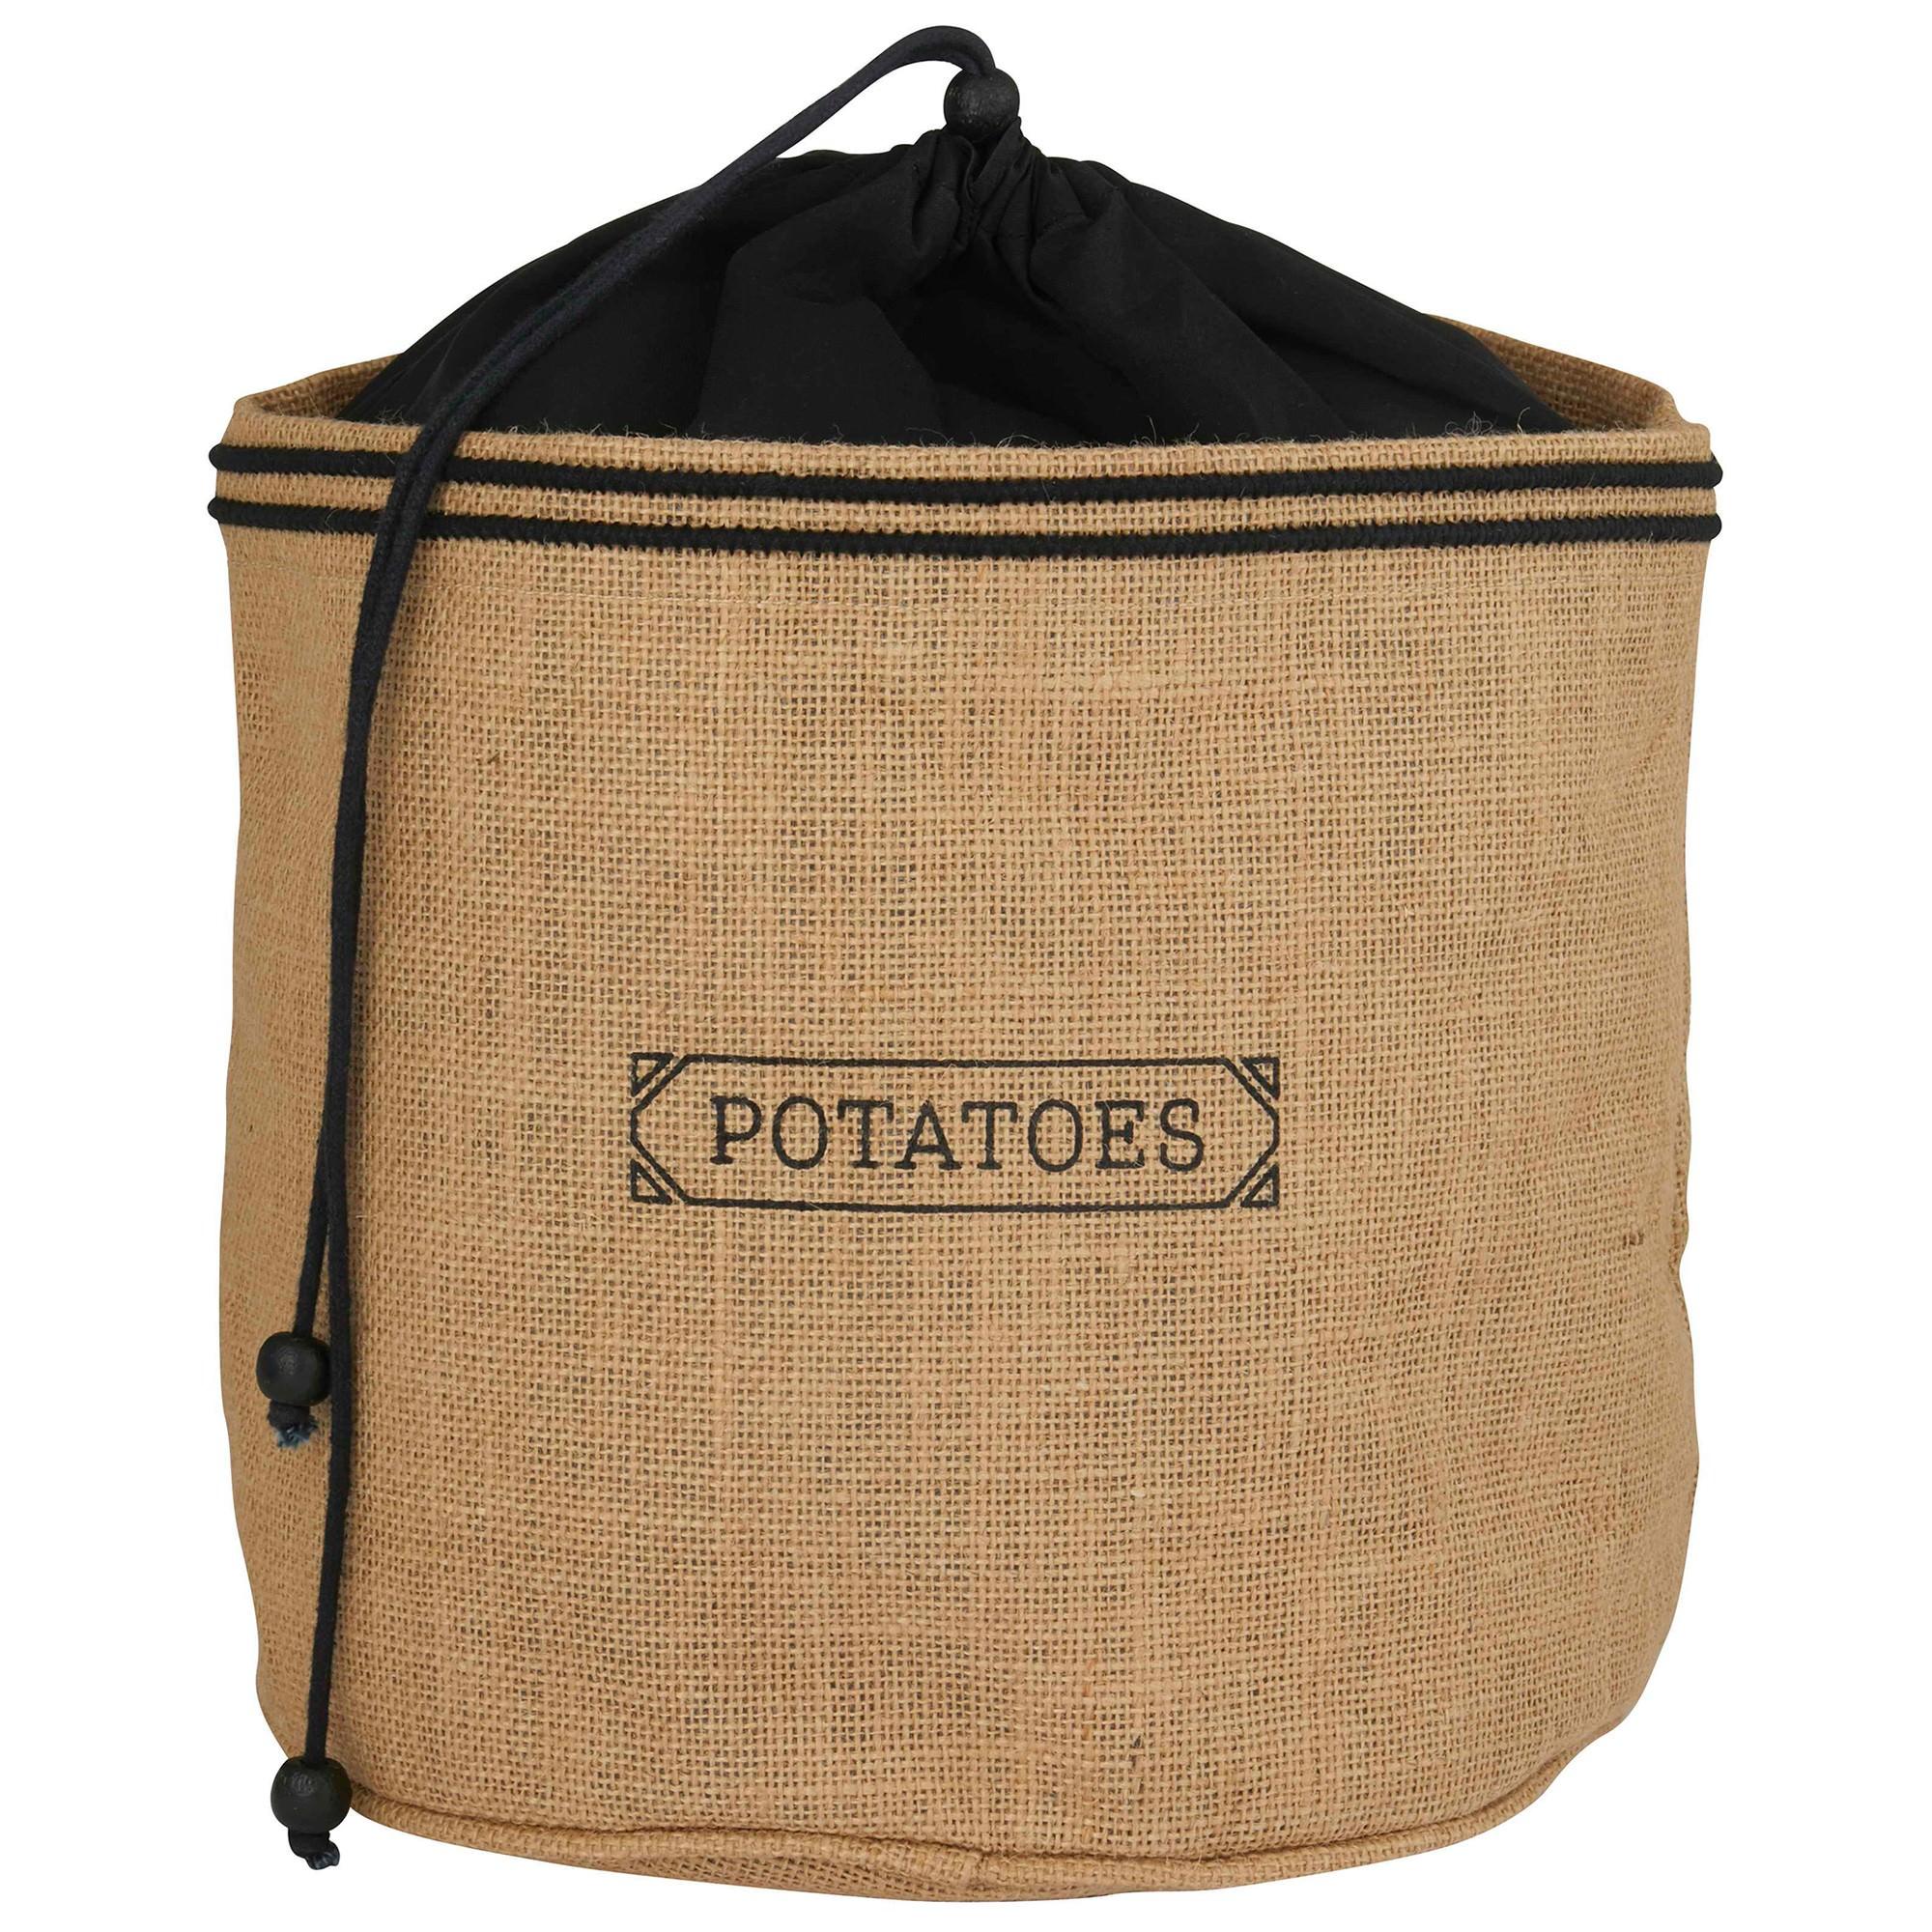 Davis & Waddell Jute Potato Sack